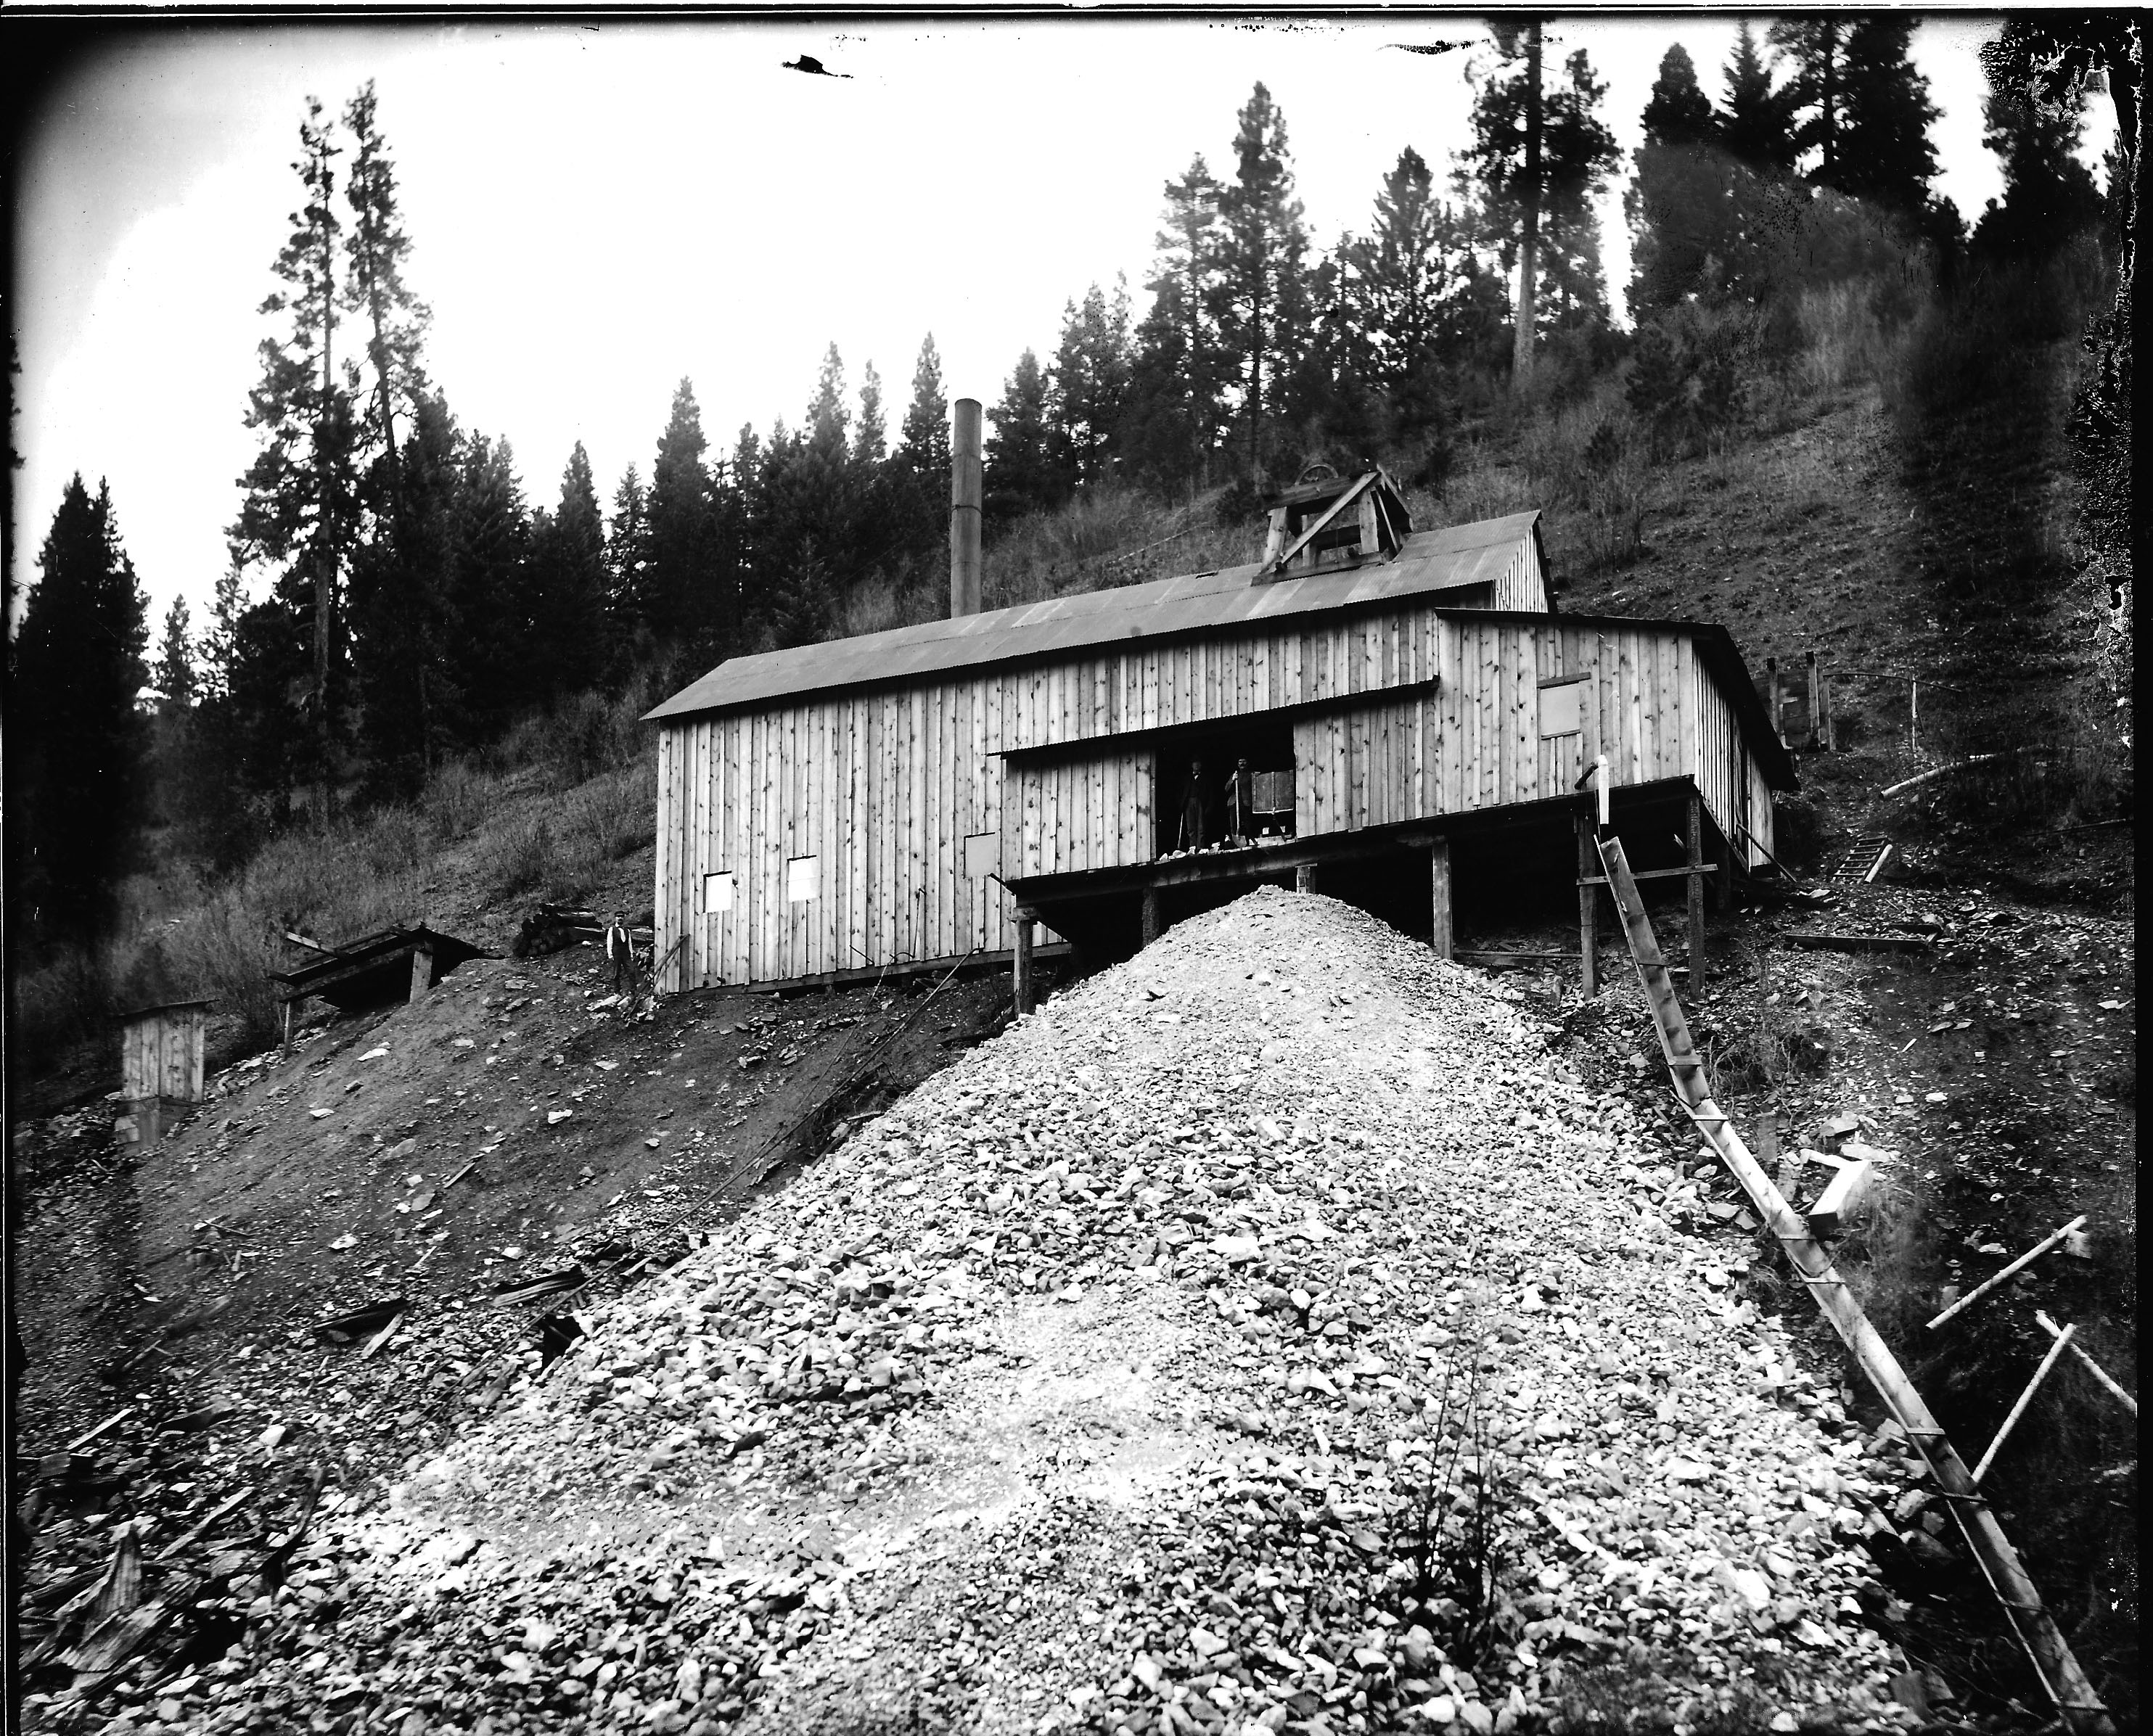 Work underway to close abandoned North Idaho mine shaft | The